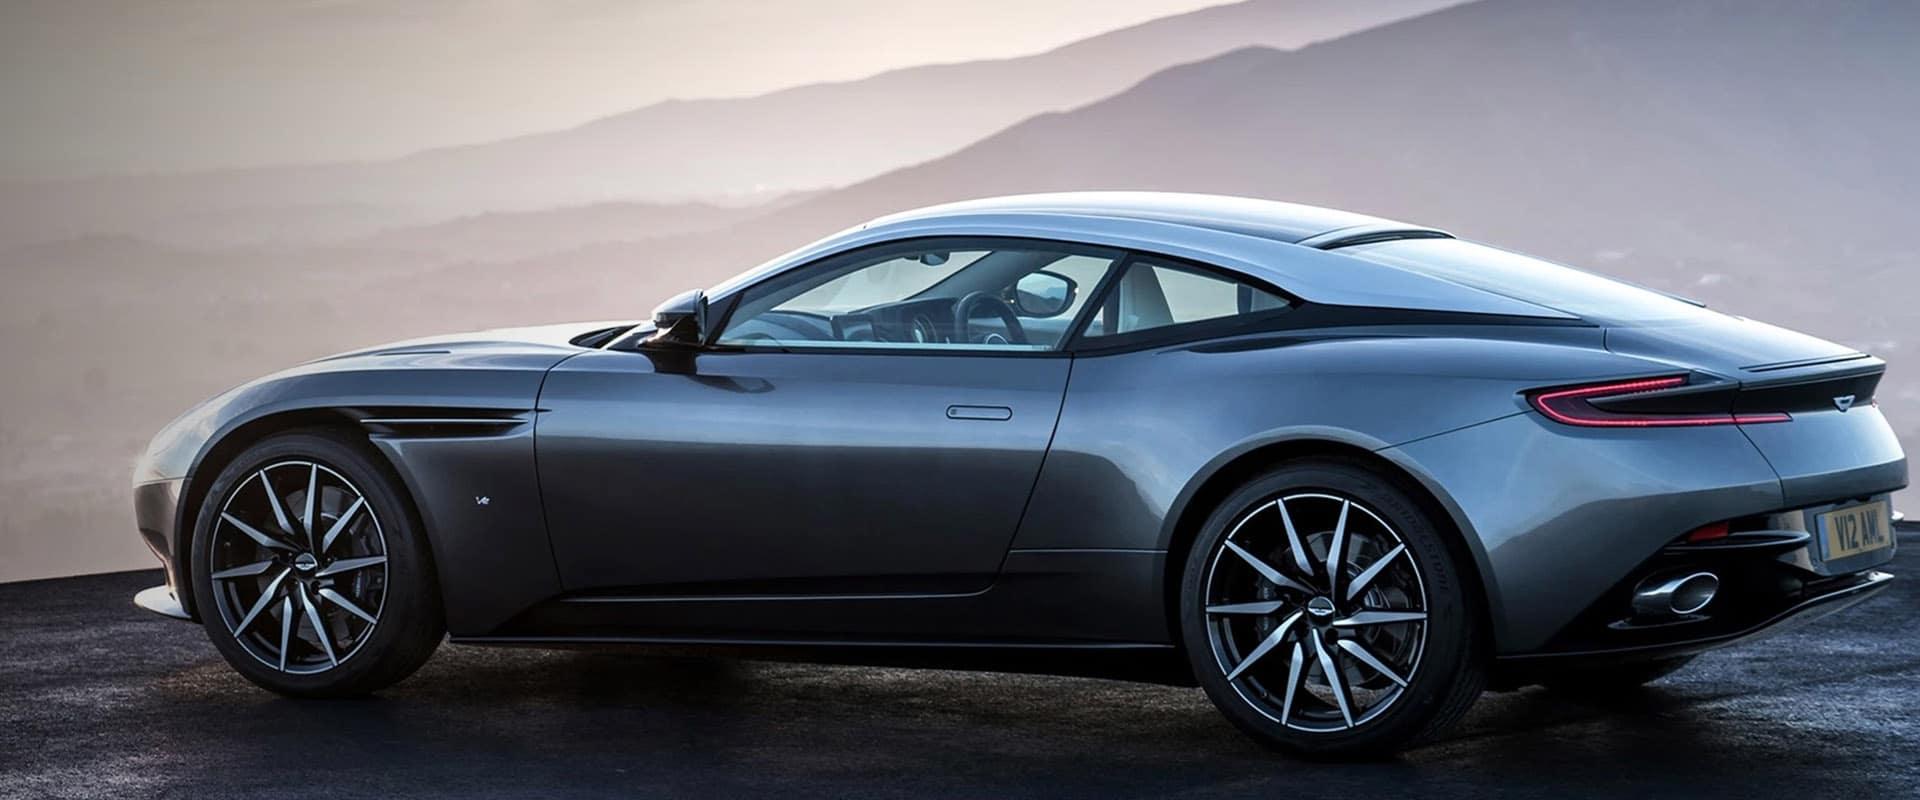 2021 Aston DB11 at Aston Martin Austin.